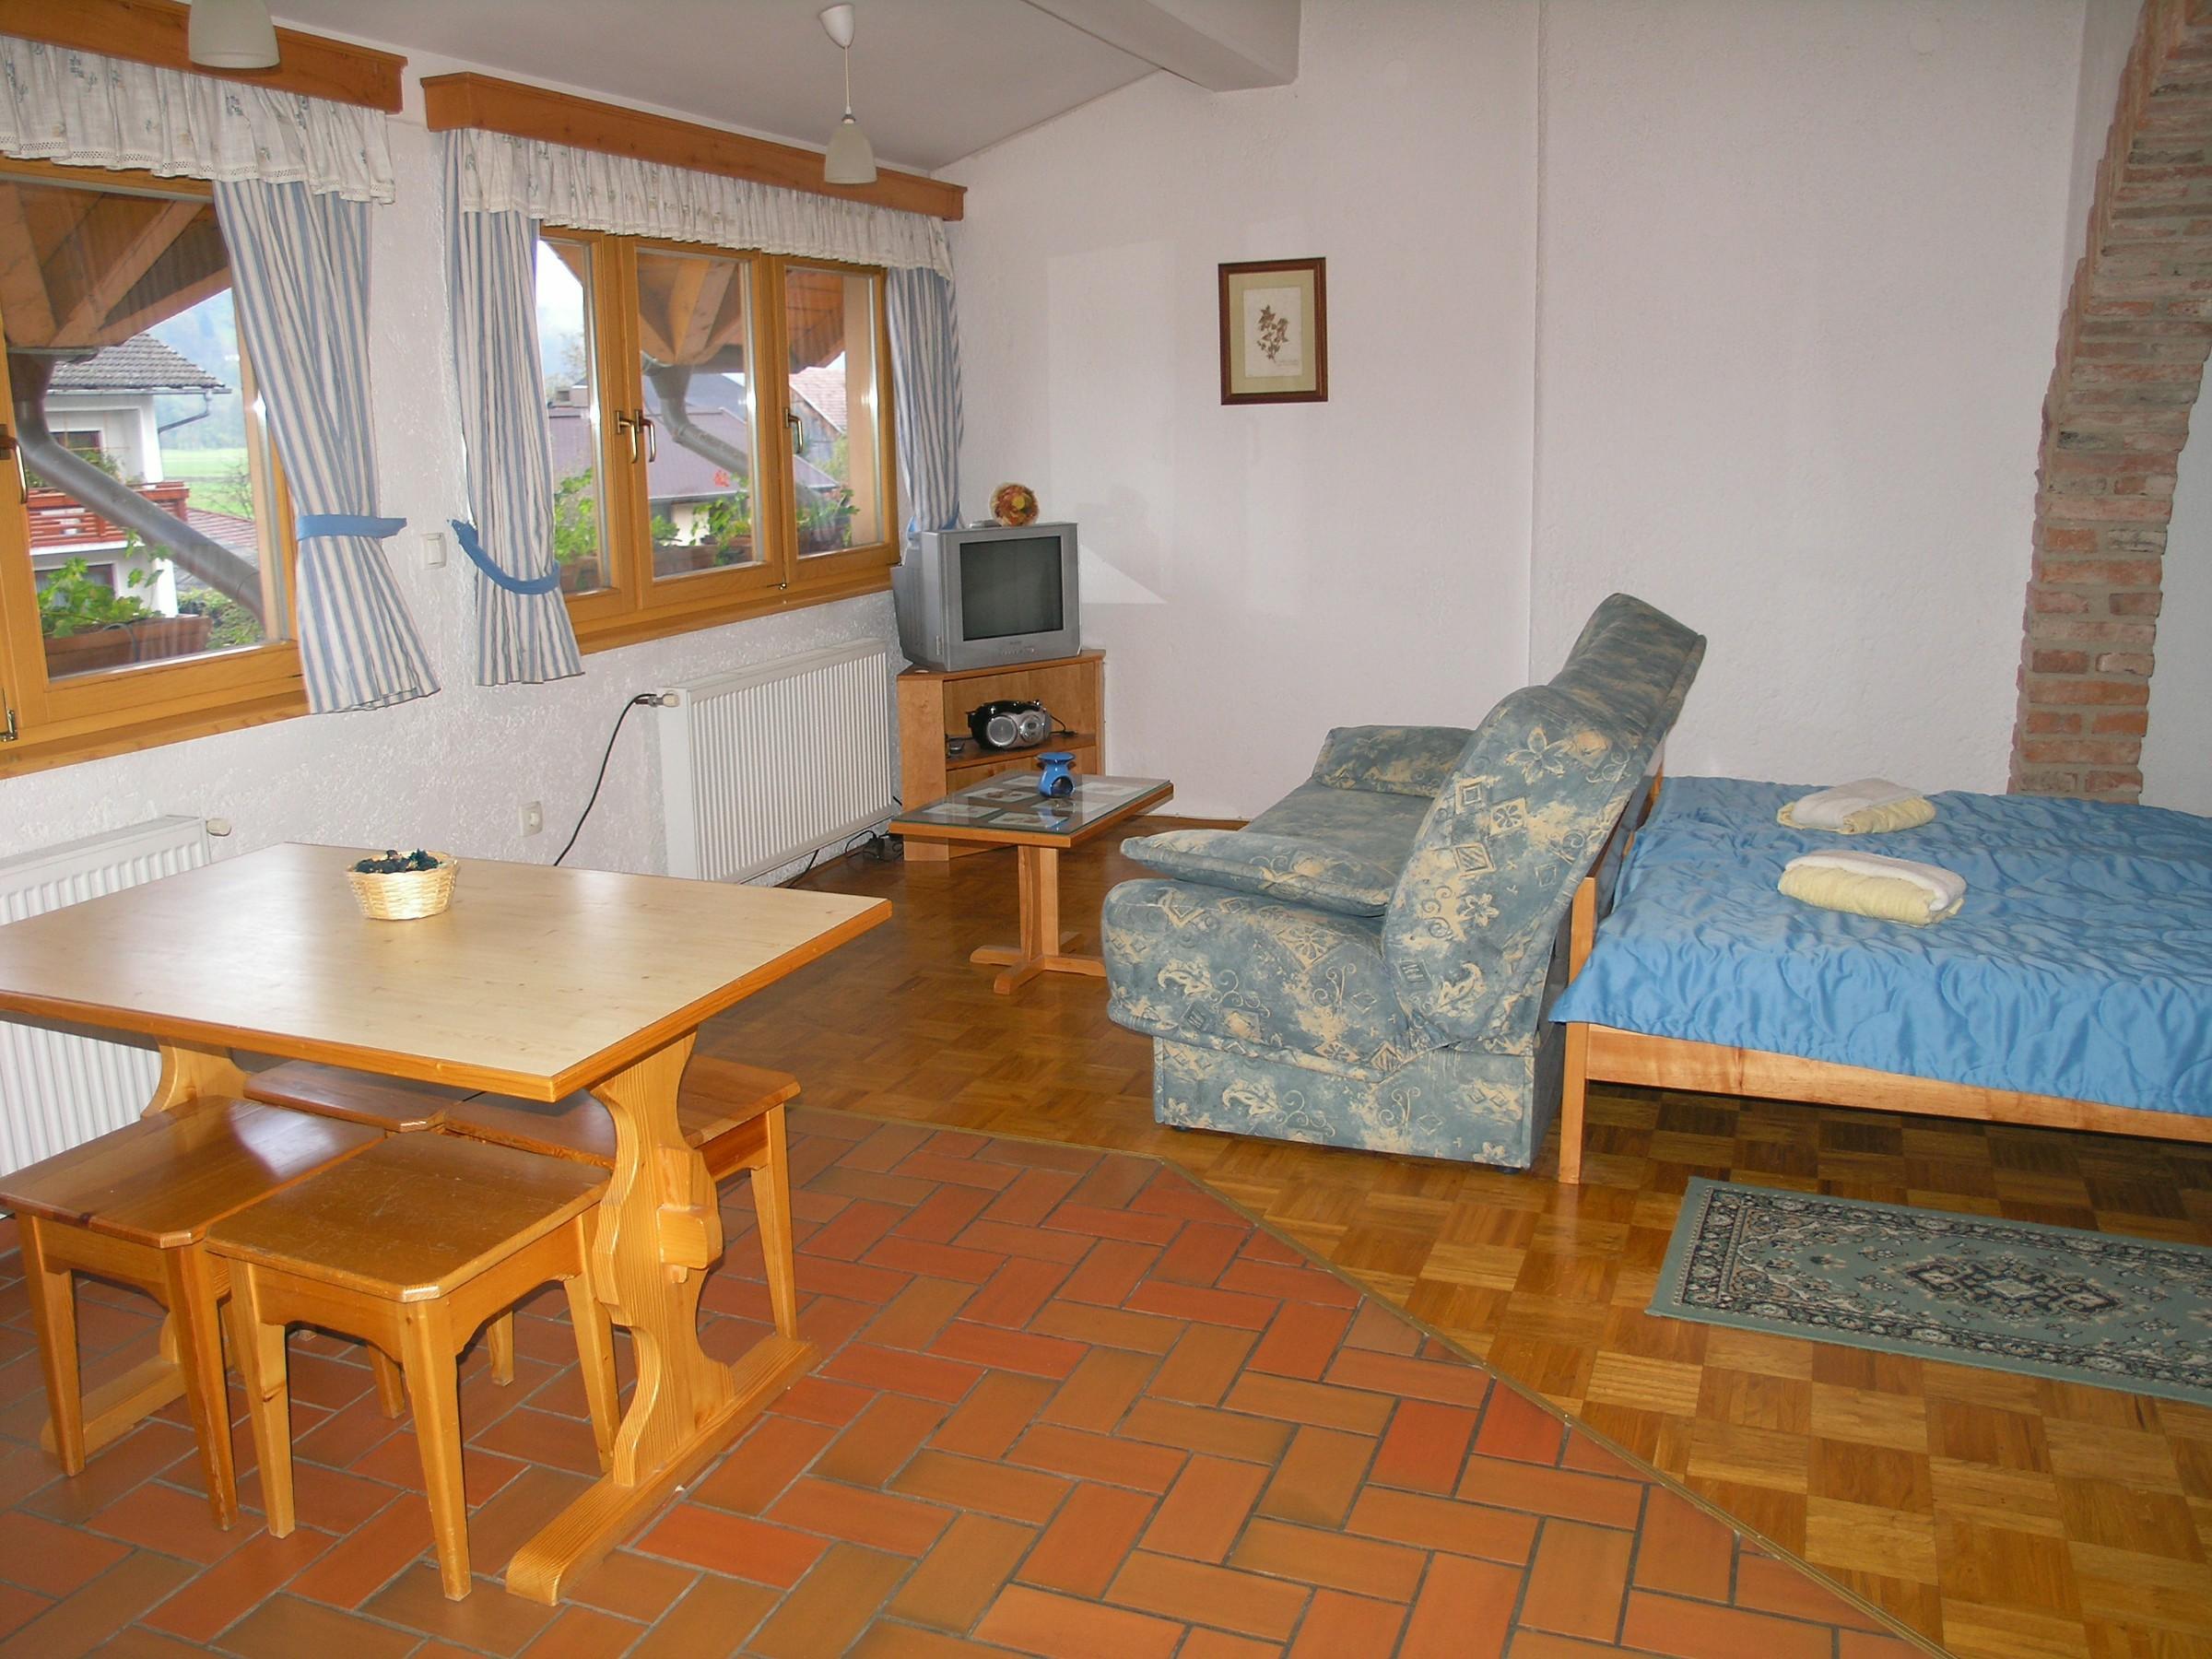 FormatFactoryBrineƒev mlin- Apartma, foto arhiv Brineƒev mlin, Savinjska dolina